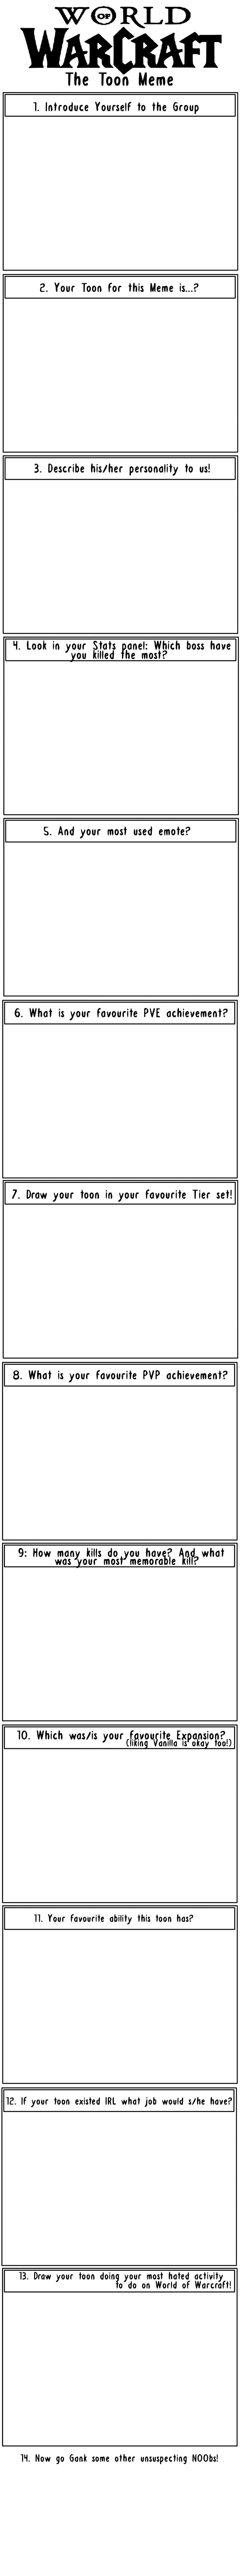 World of Warcraft: Toon Meme by Bhryn